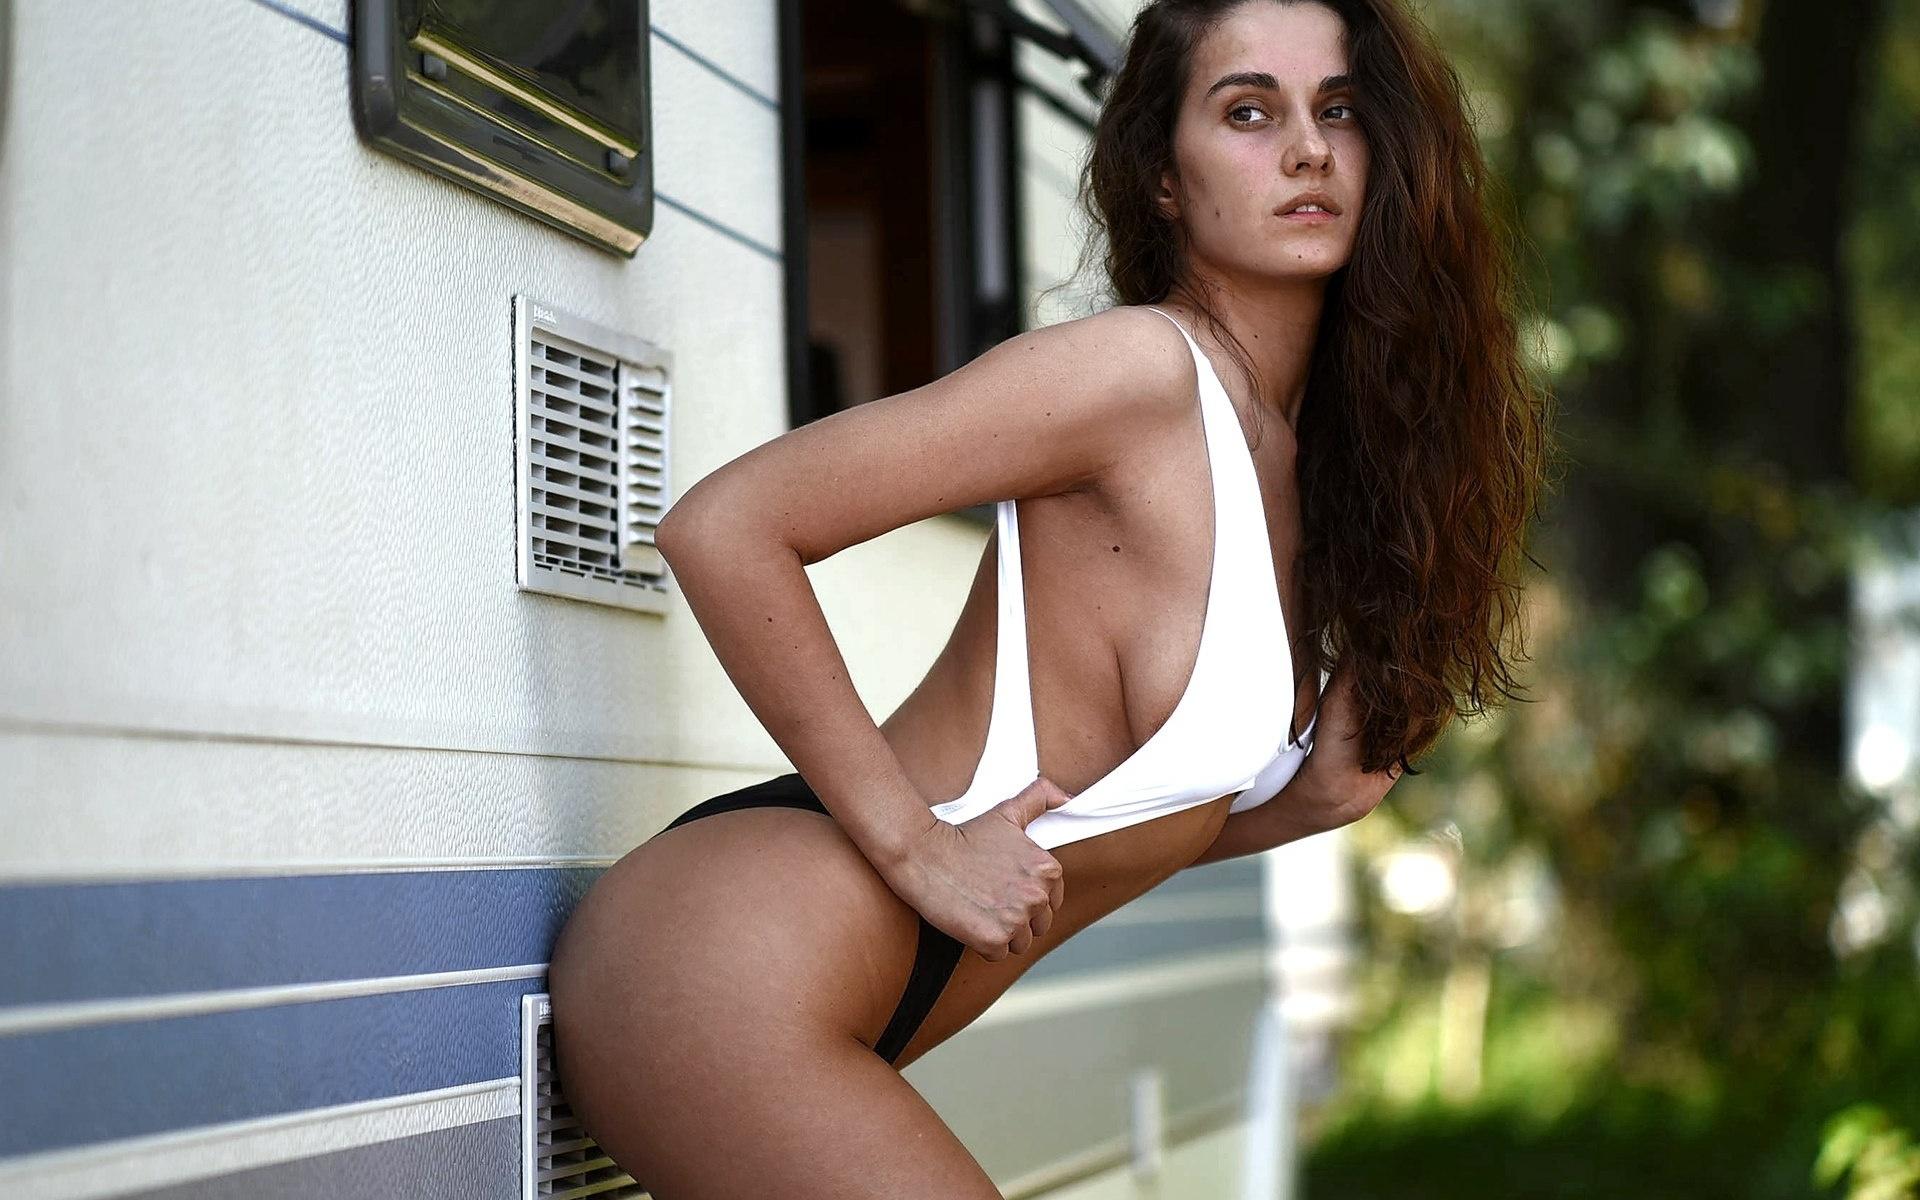 kate petrova, women, model, brunette, sideboob, looking away, ass, one-piece swimsuit, wavy hair, armpits, women outdoors